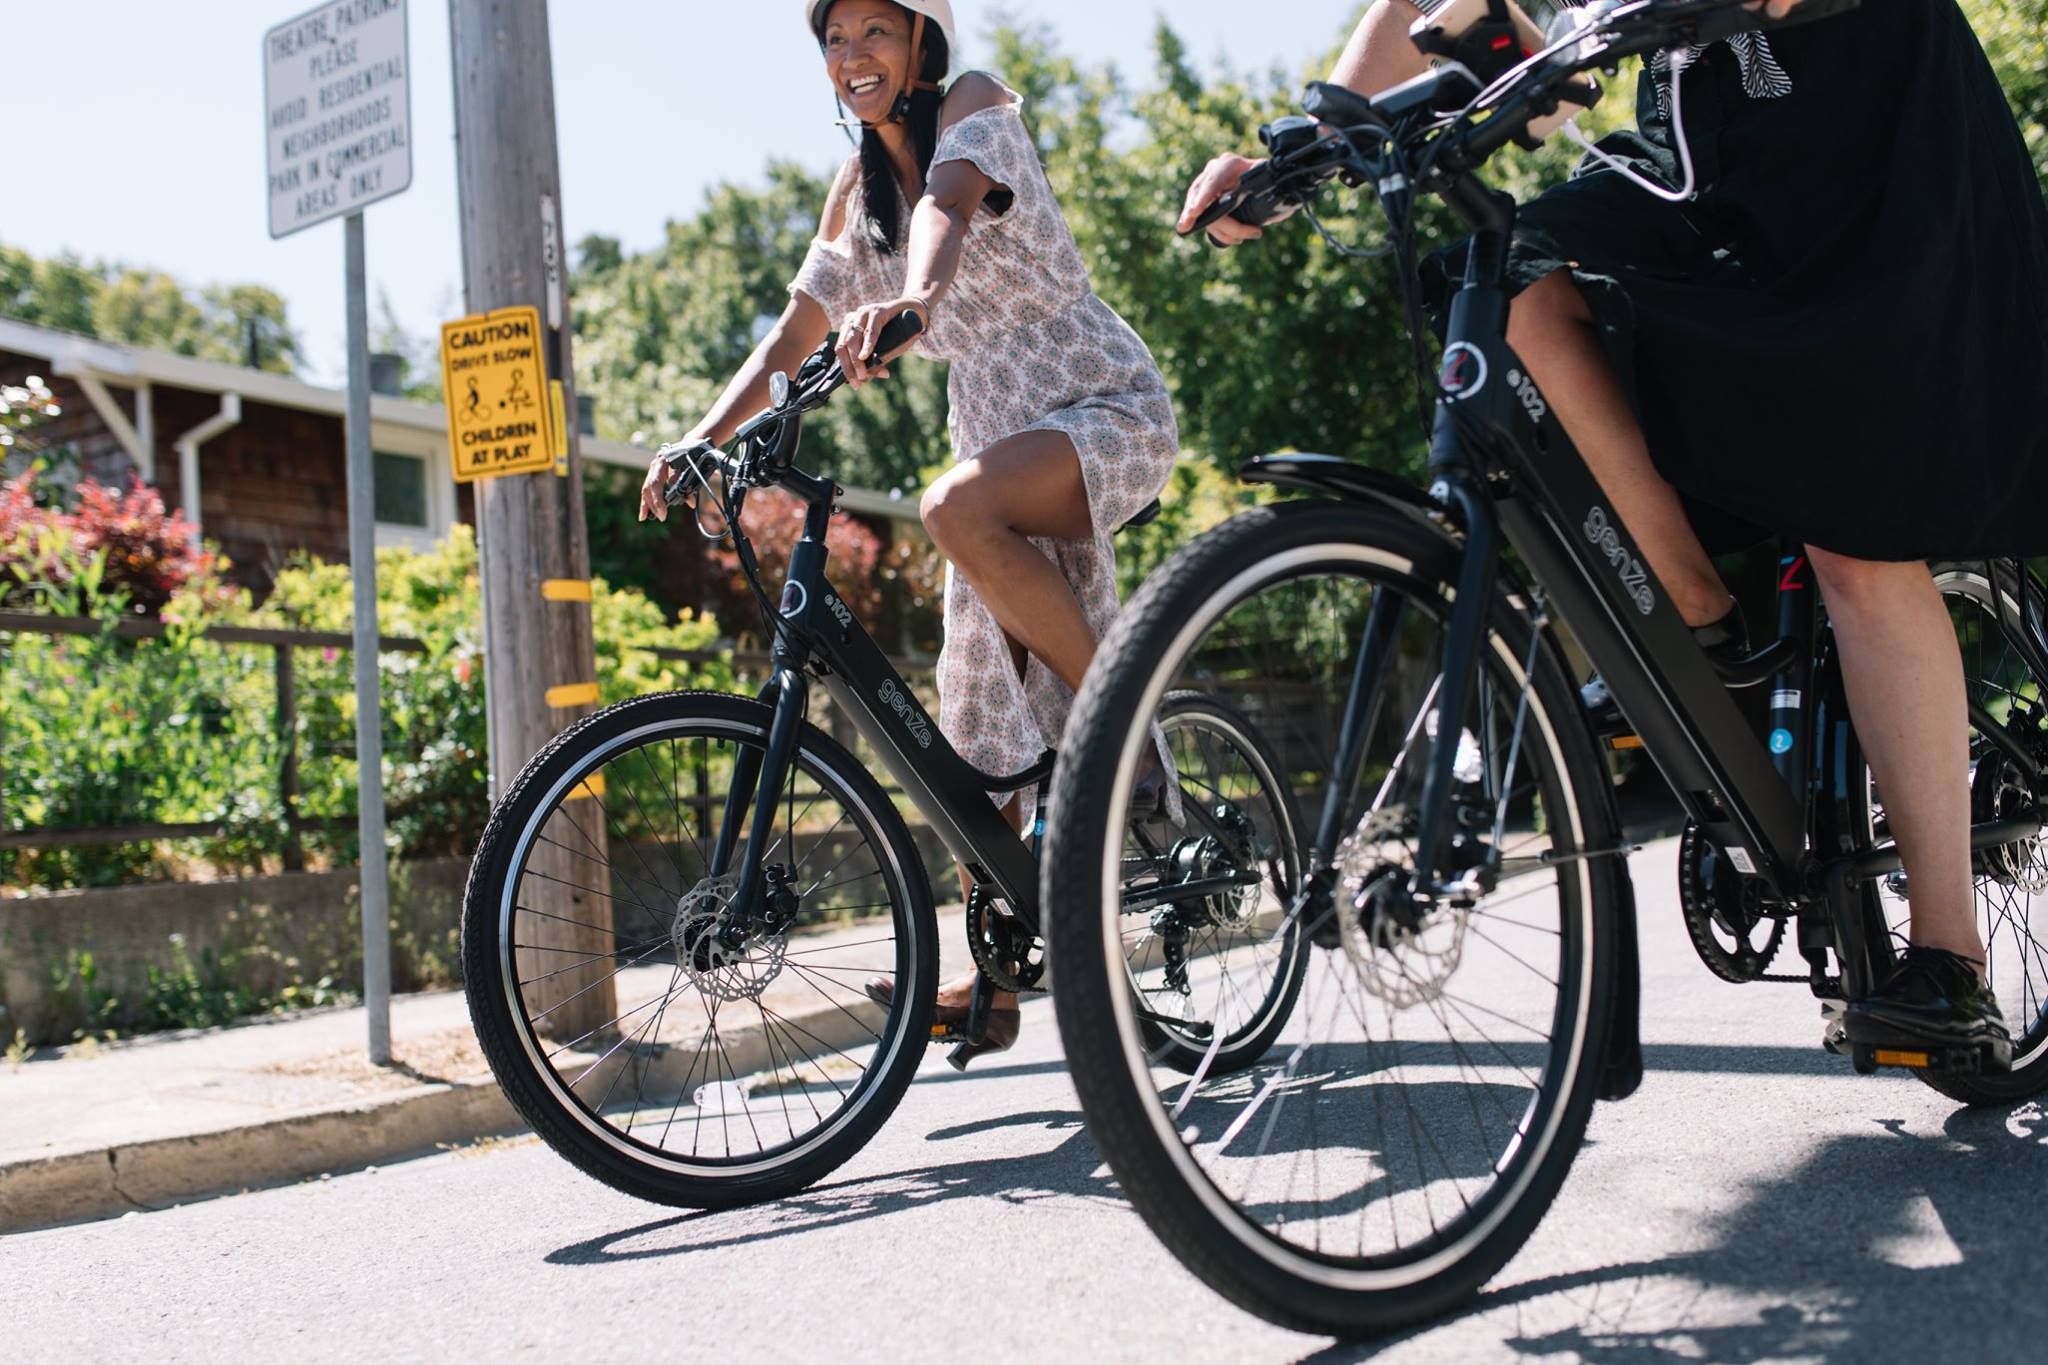 Plaid Goat Mountain Bike Festival